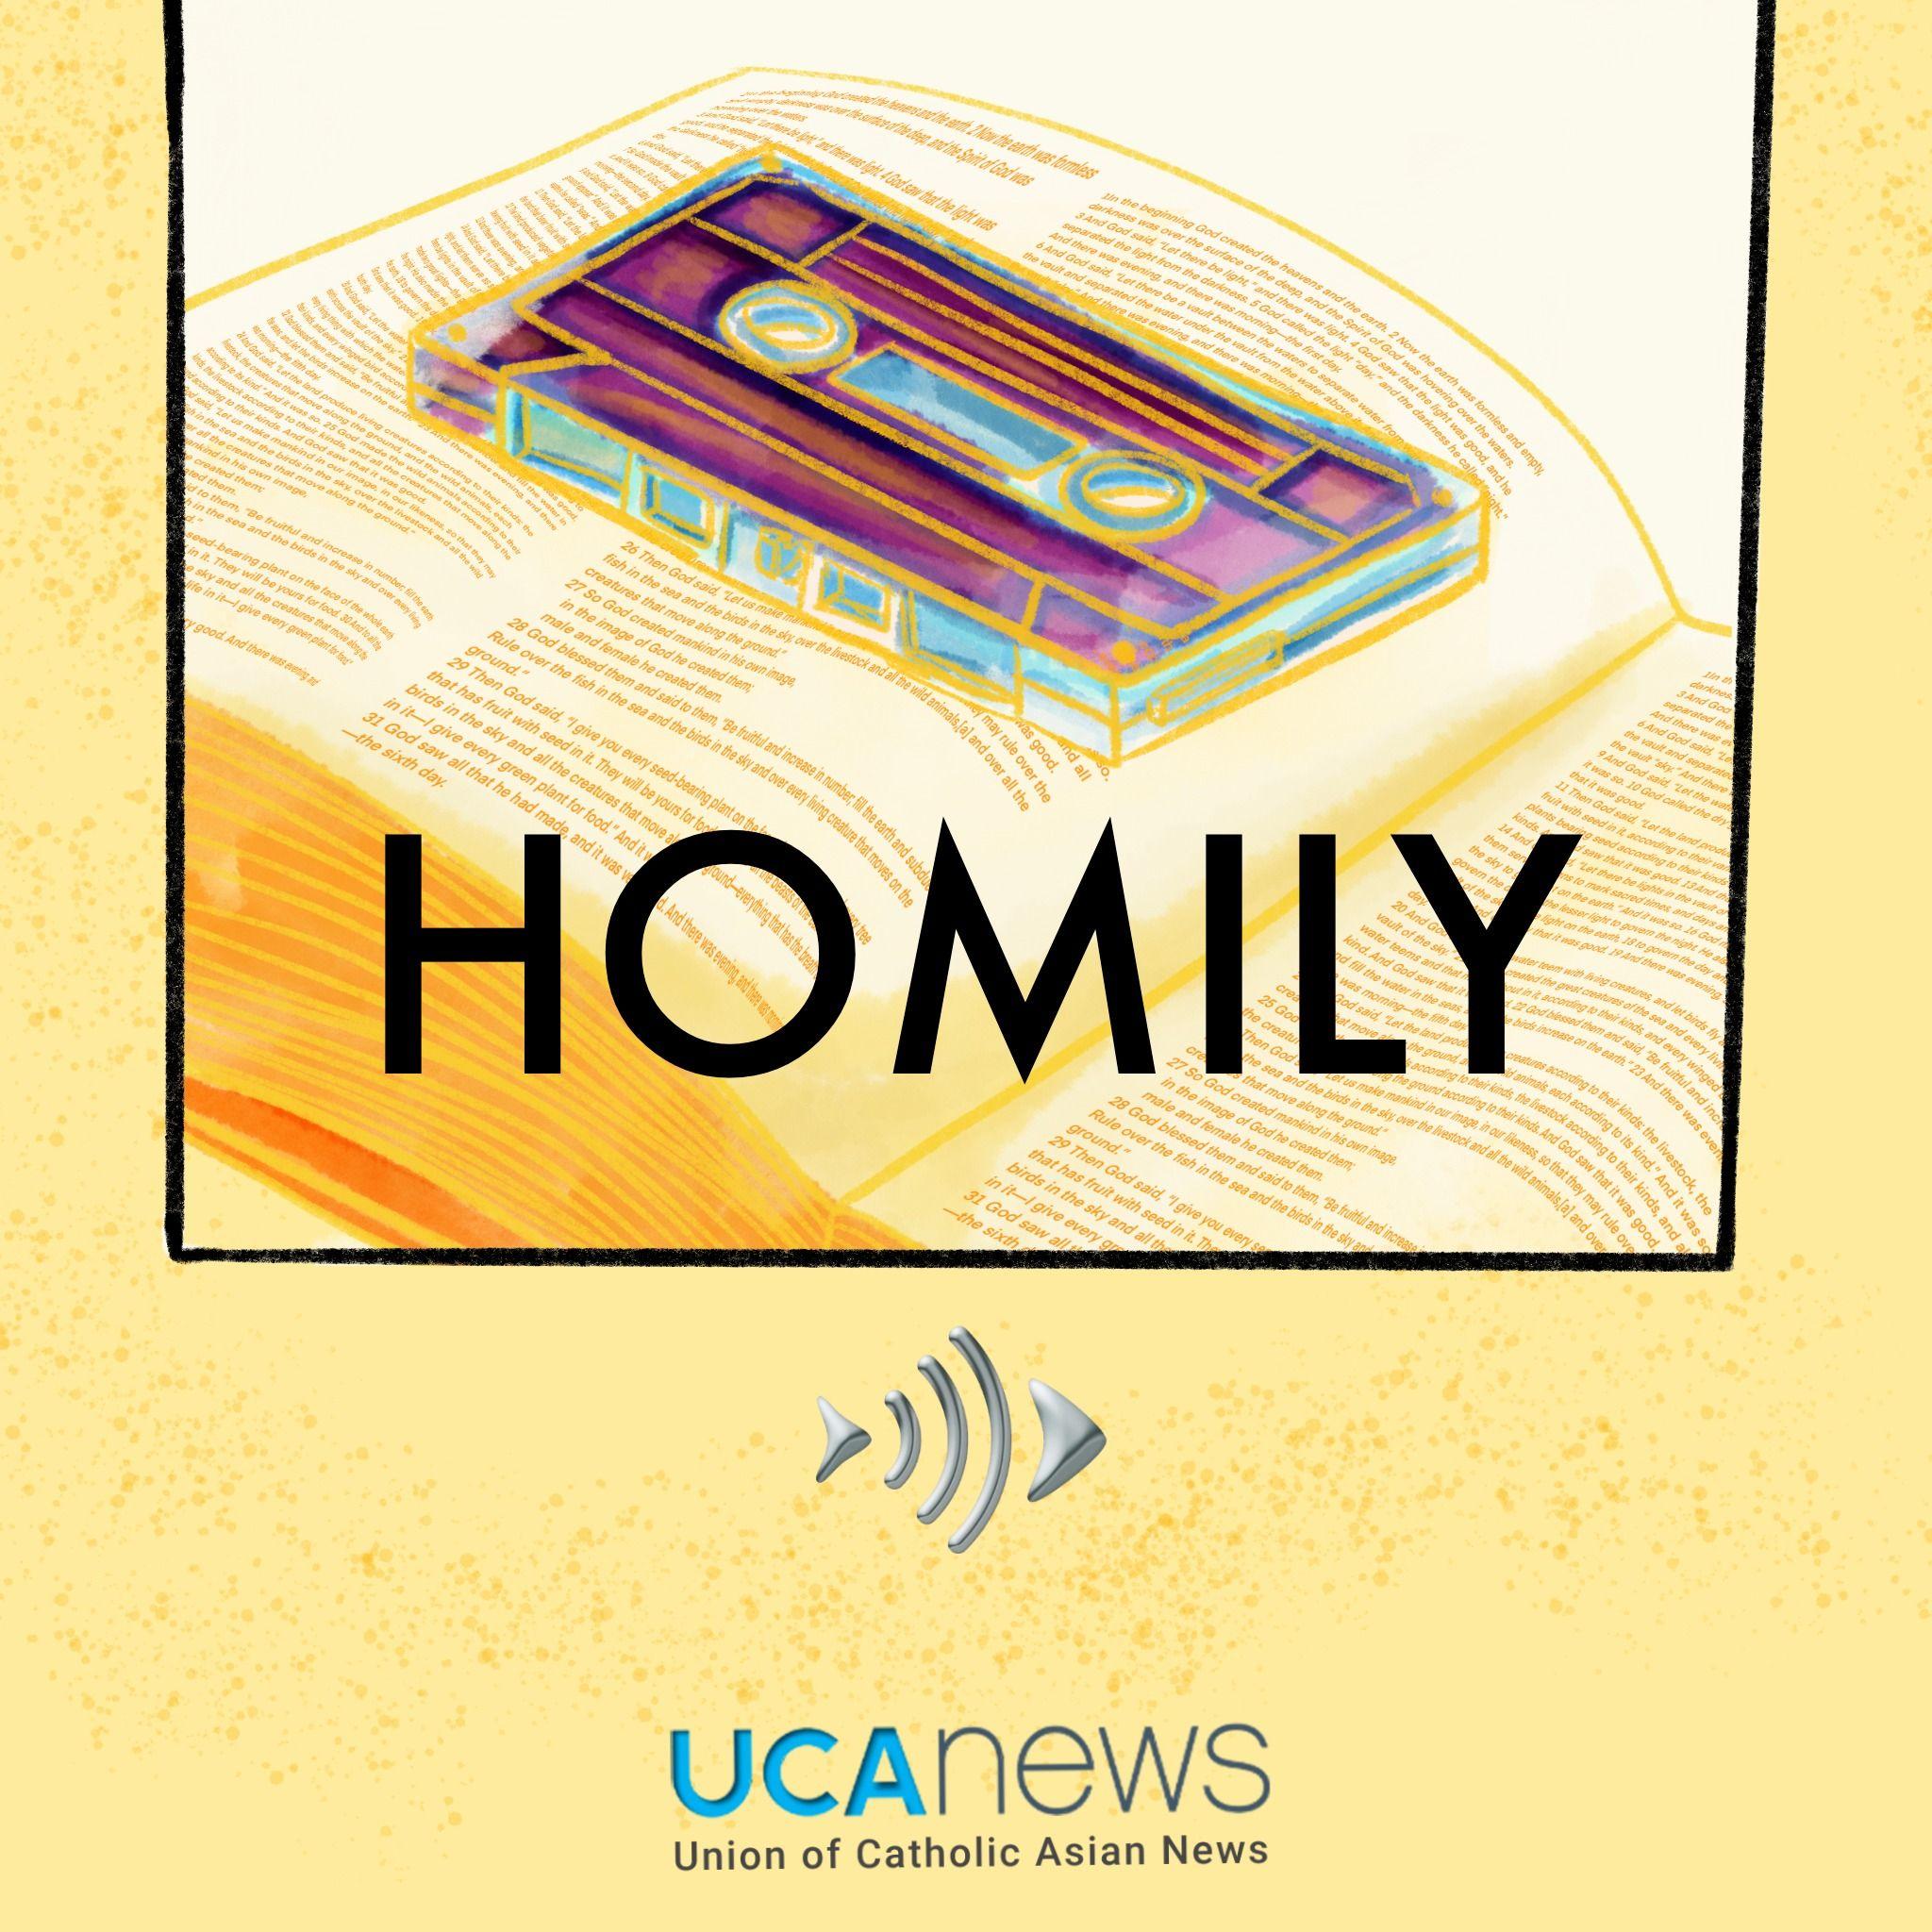 Homilies: Twenty-ninth Sunday of the Year (B) Oct. 17, 2021